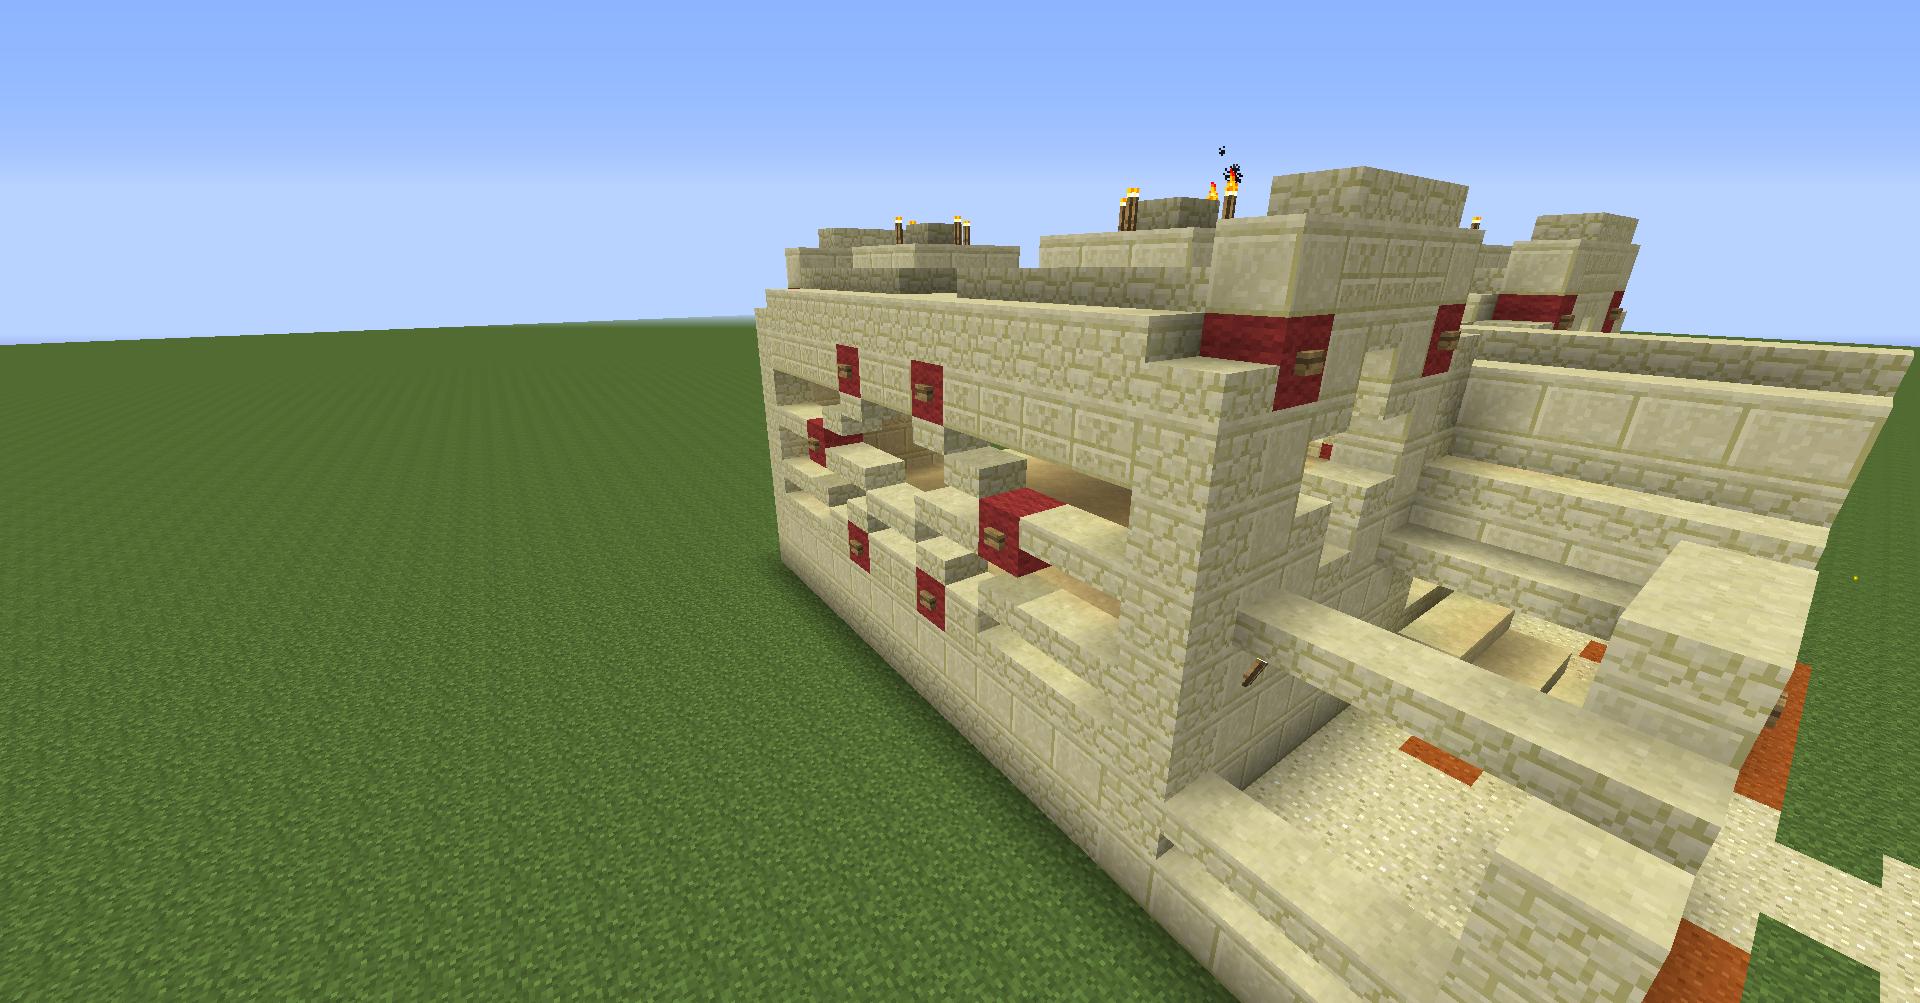 how to build a garden in minecraft creative mode